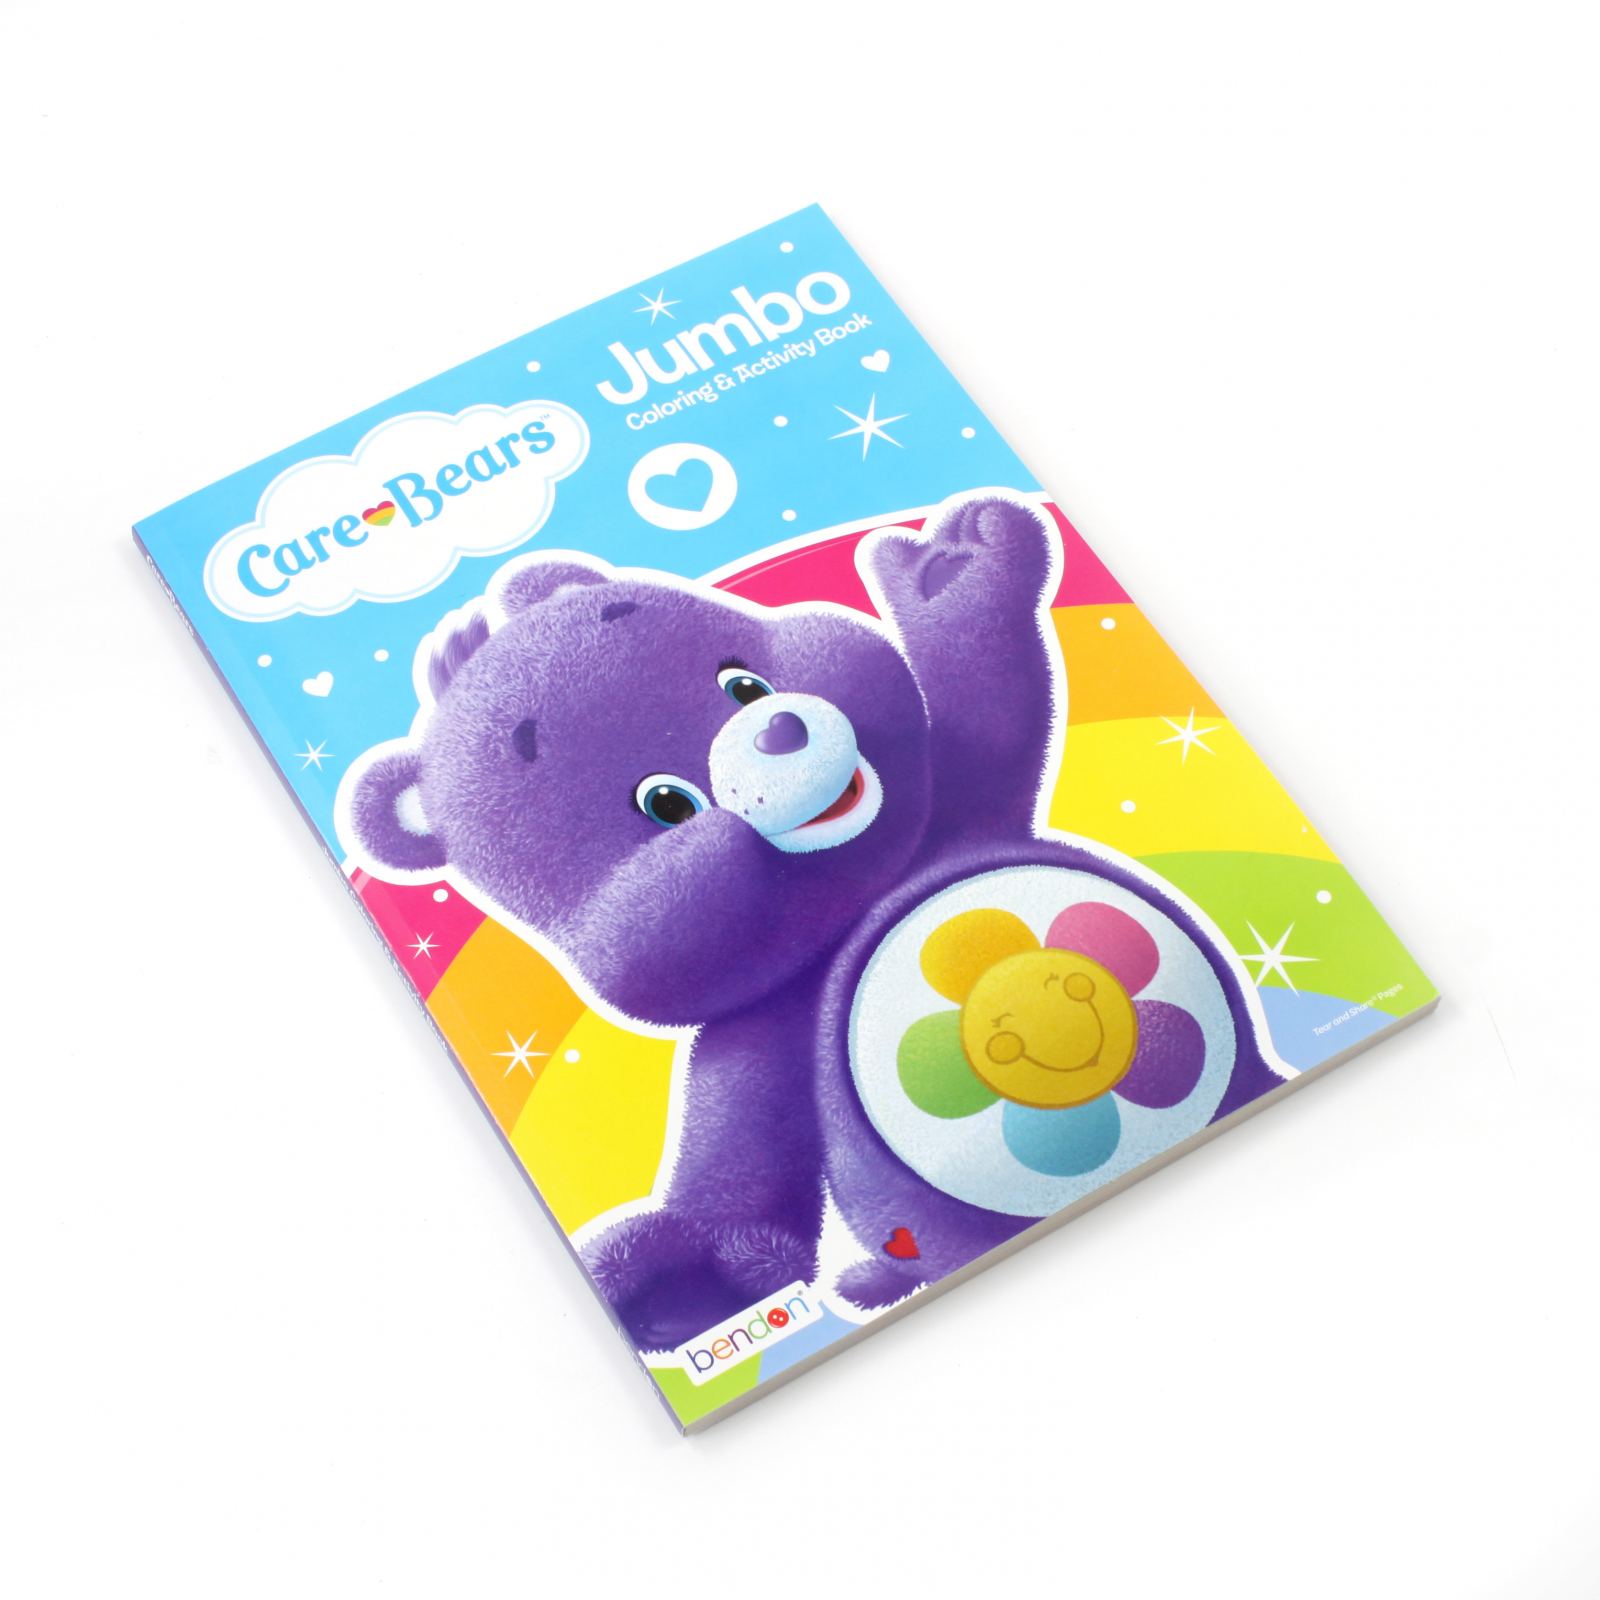 Care Bears Kids Jumbo Coloring Book Activity Harmony Bear